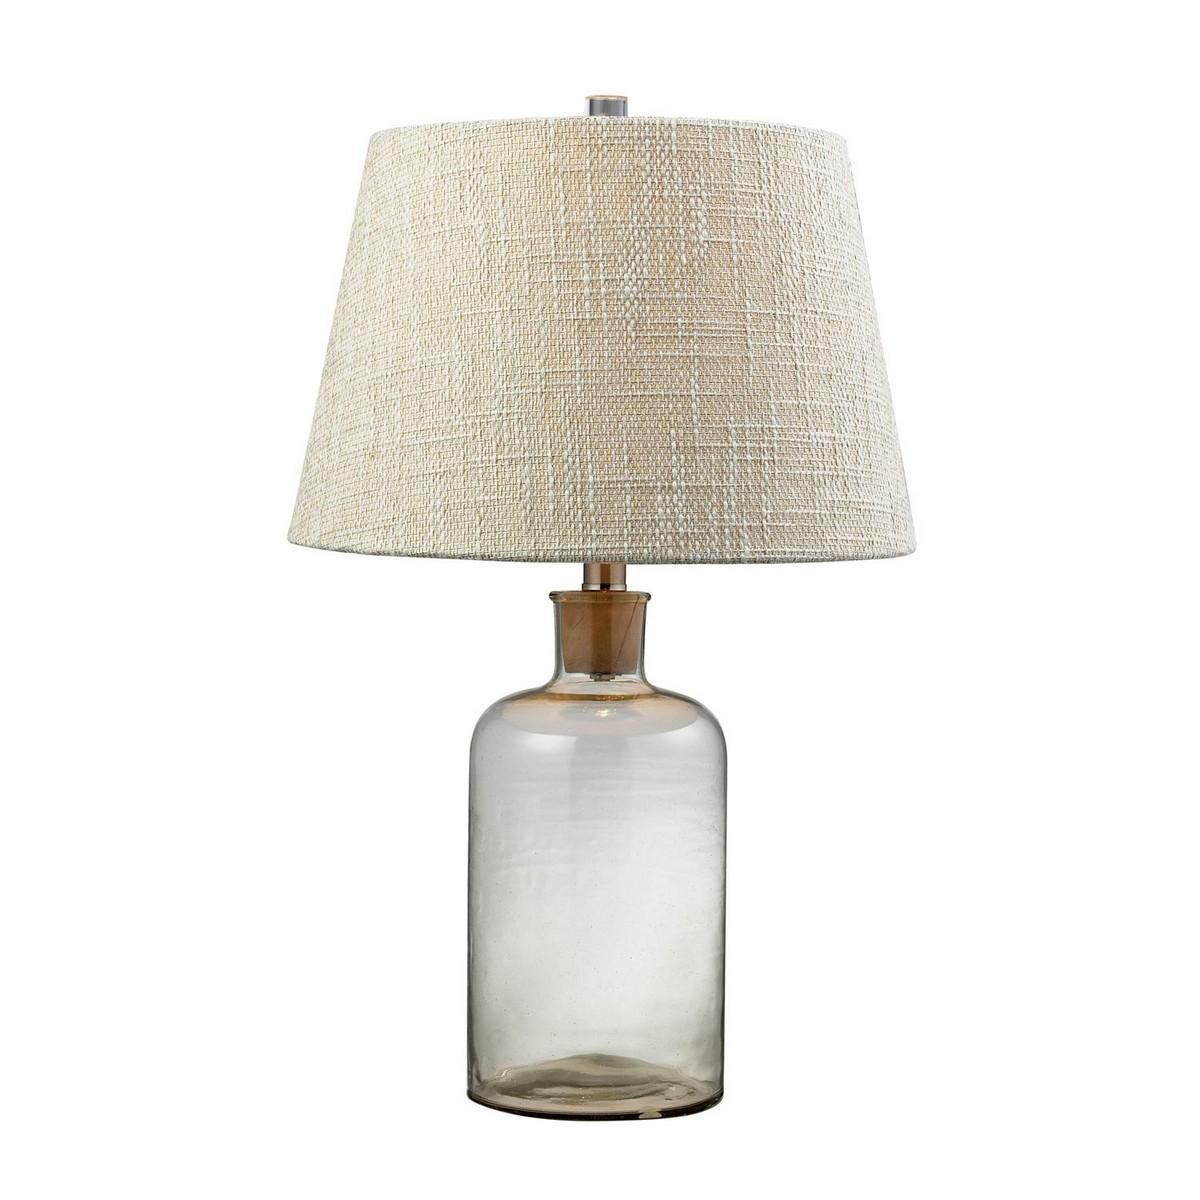 Elk Lighting D137 Table Lamp - Clear